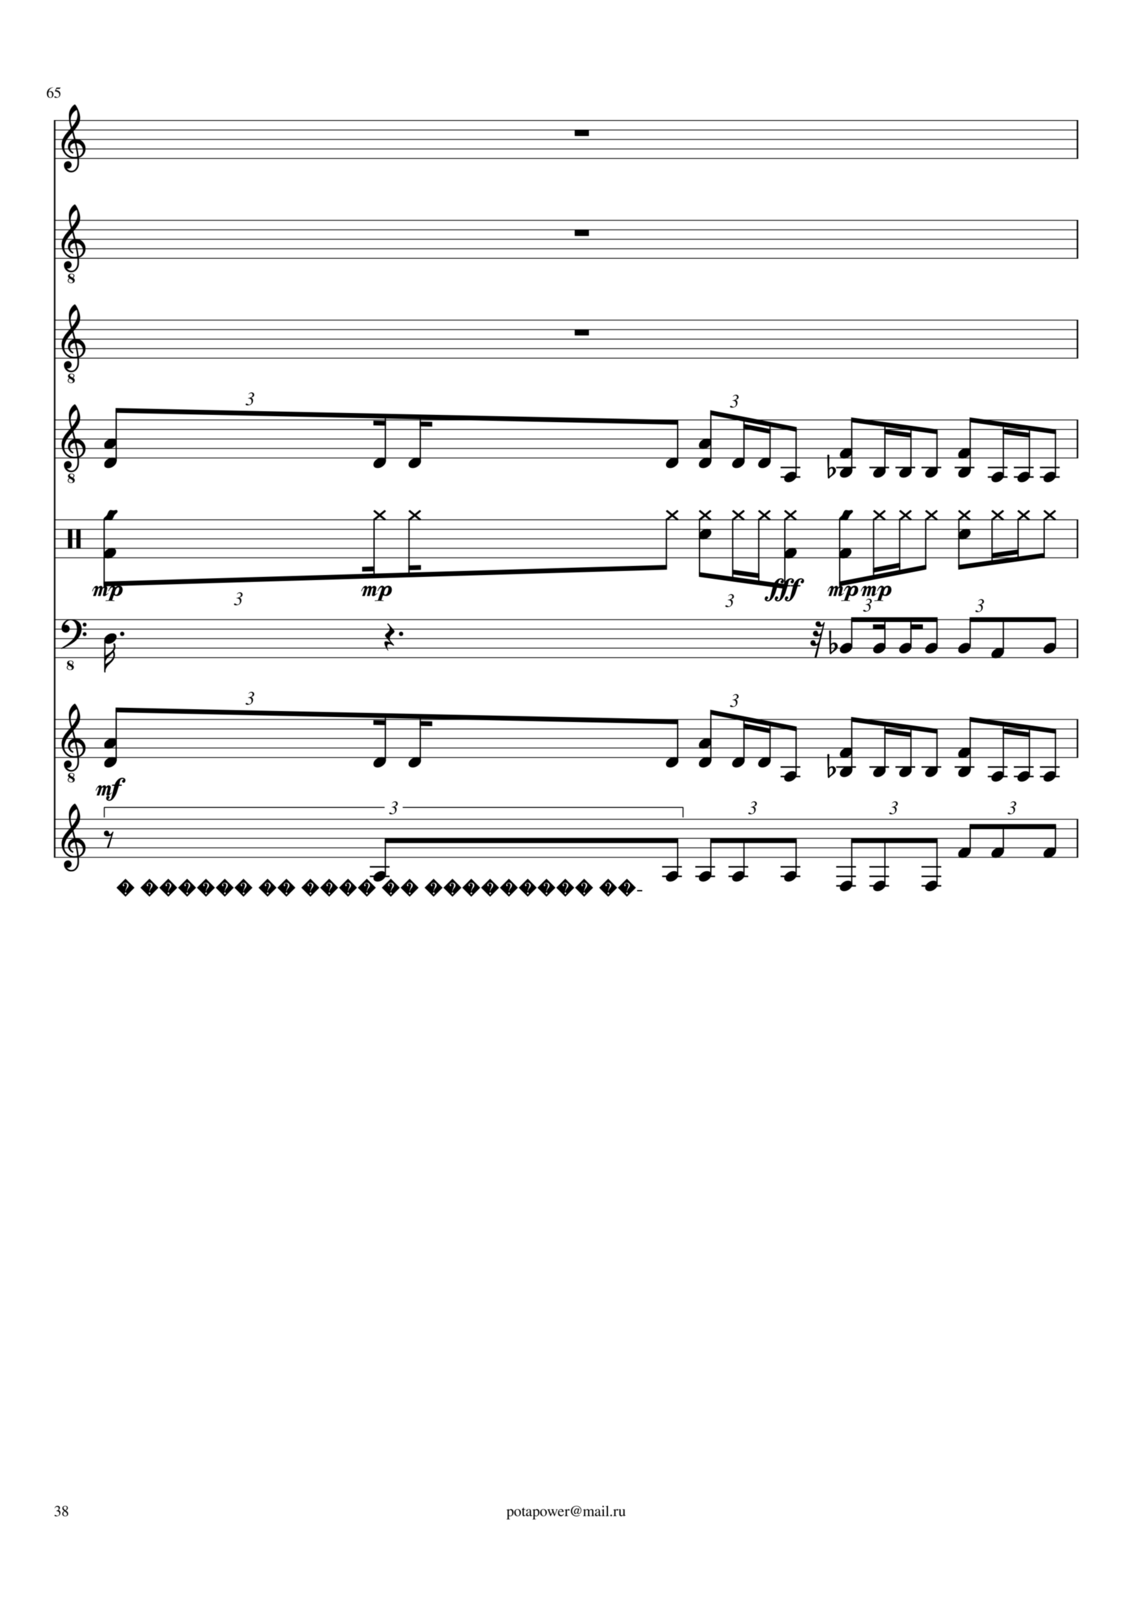 Korolevstvo slez slide, Image 38